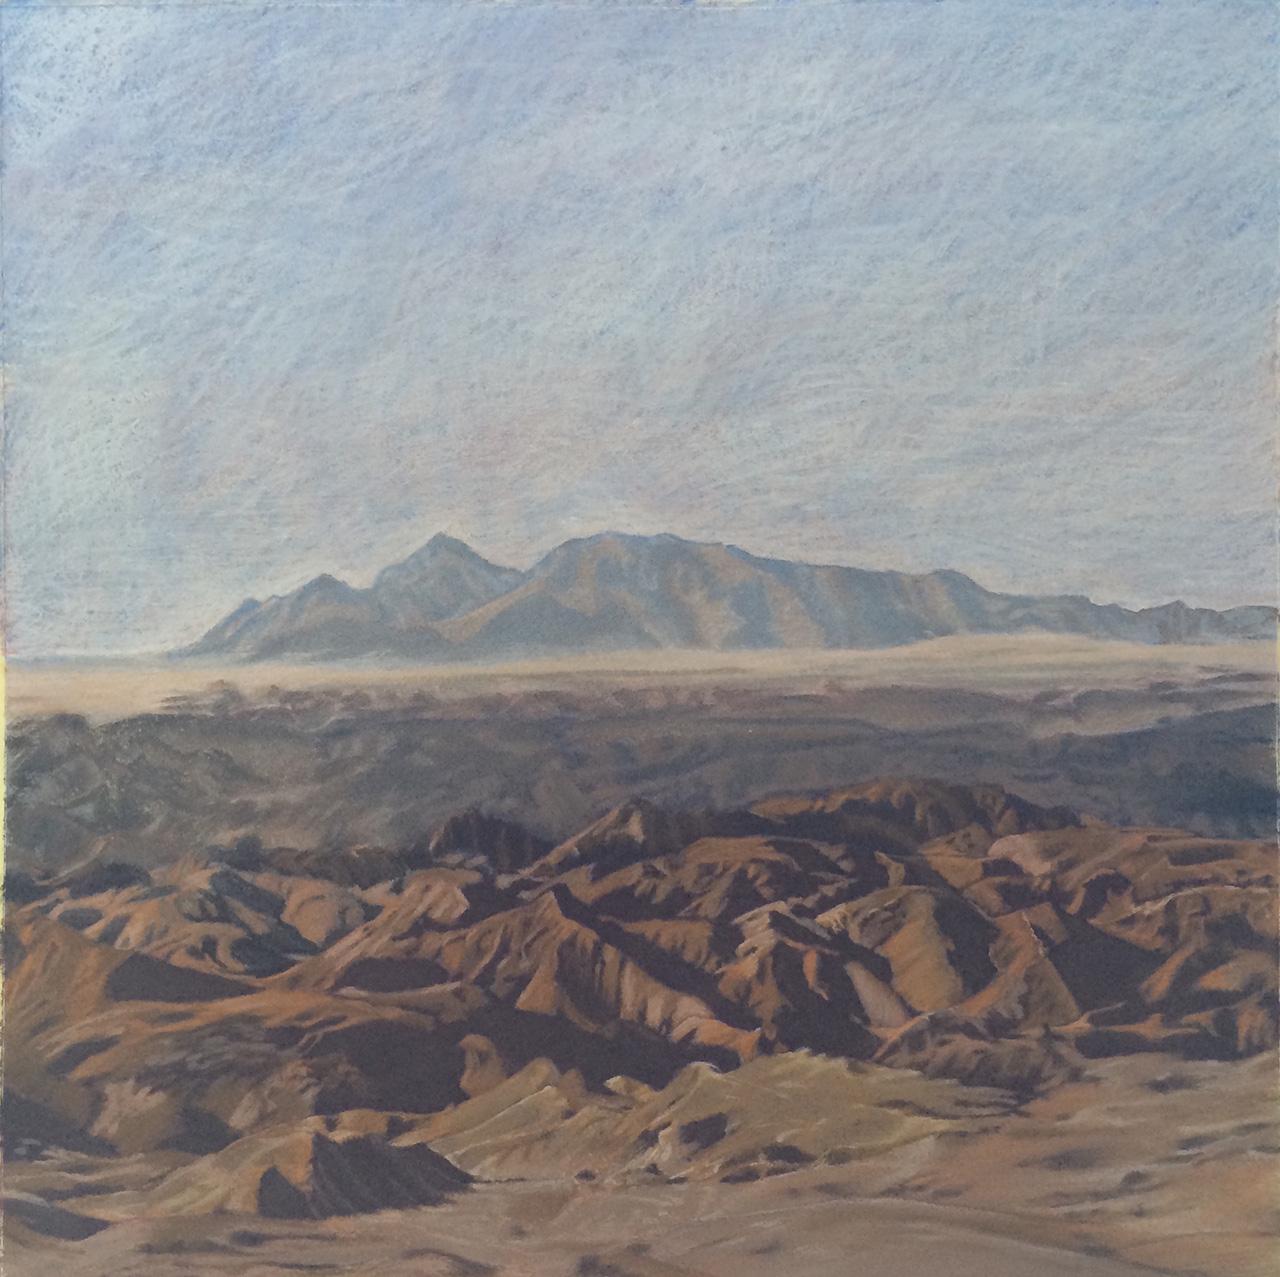 Strand Hotel, Swakopmund-Moon landscape, Namibia 1 for KM2K Design by Louise Hennigs